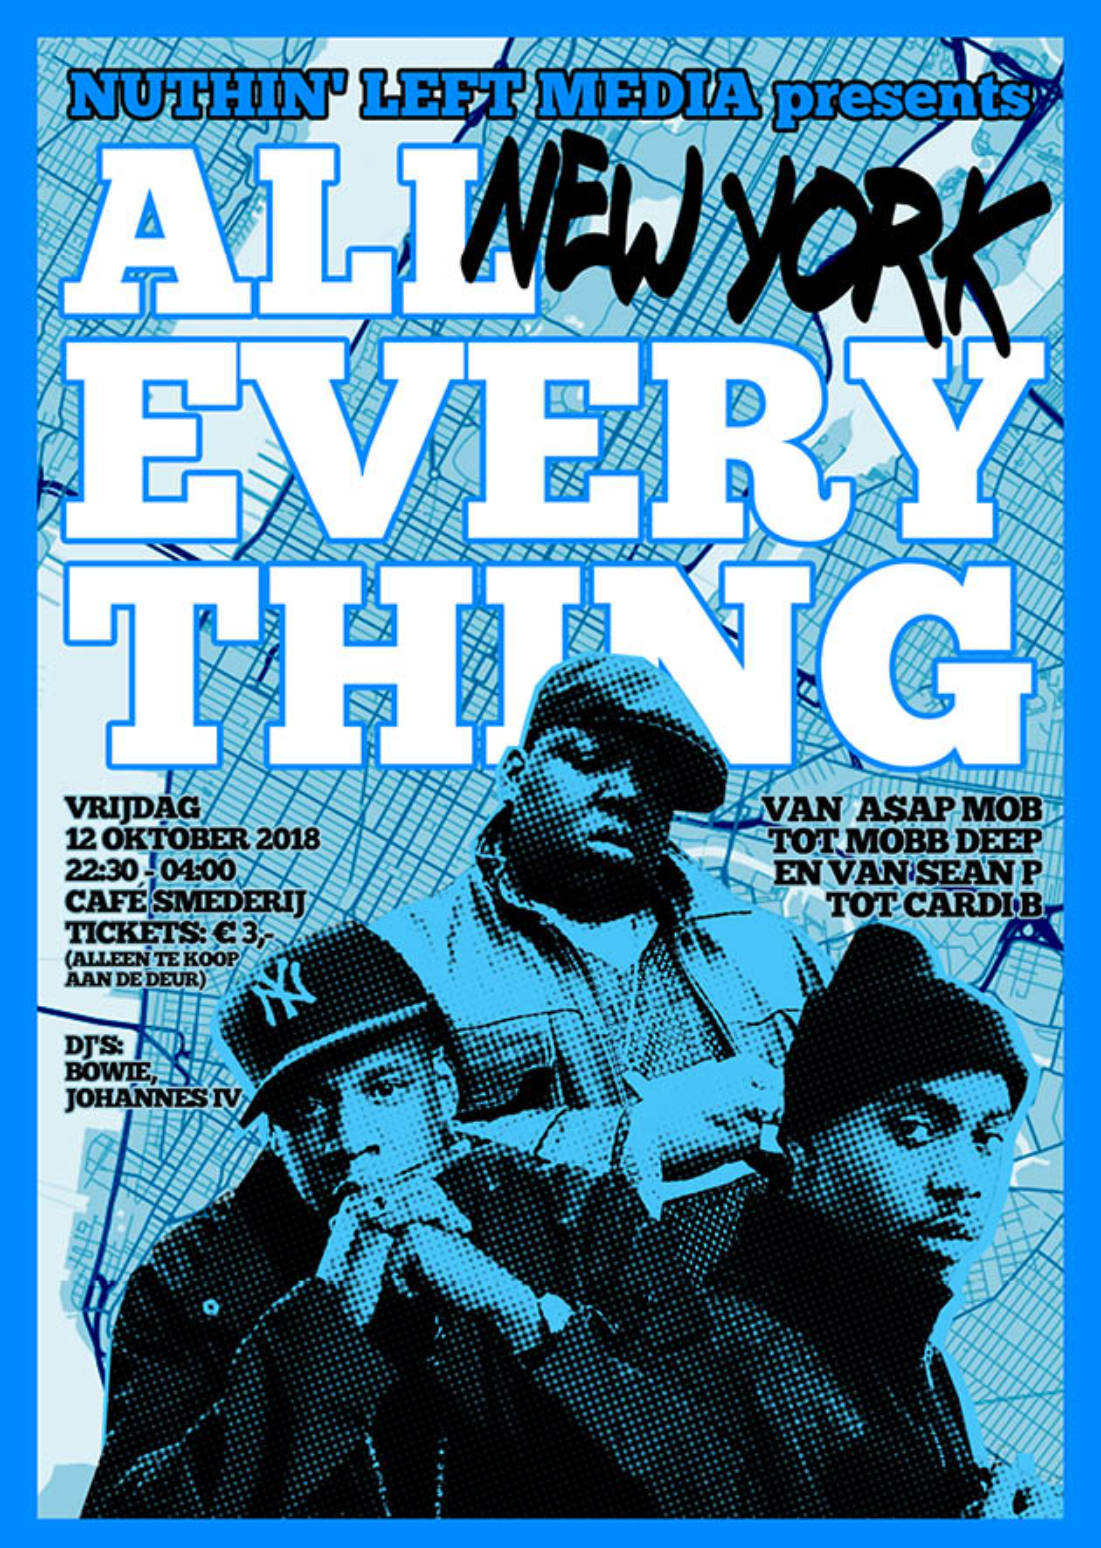 All New York Everything